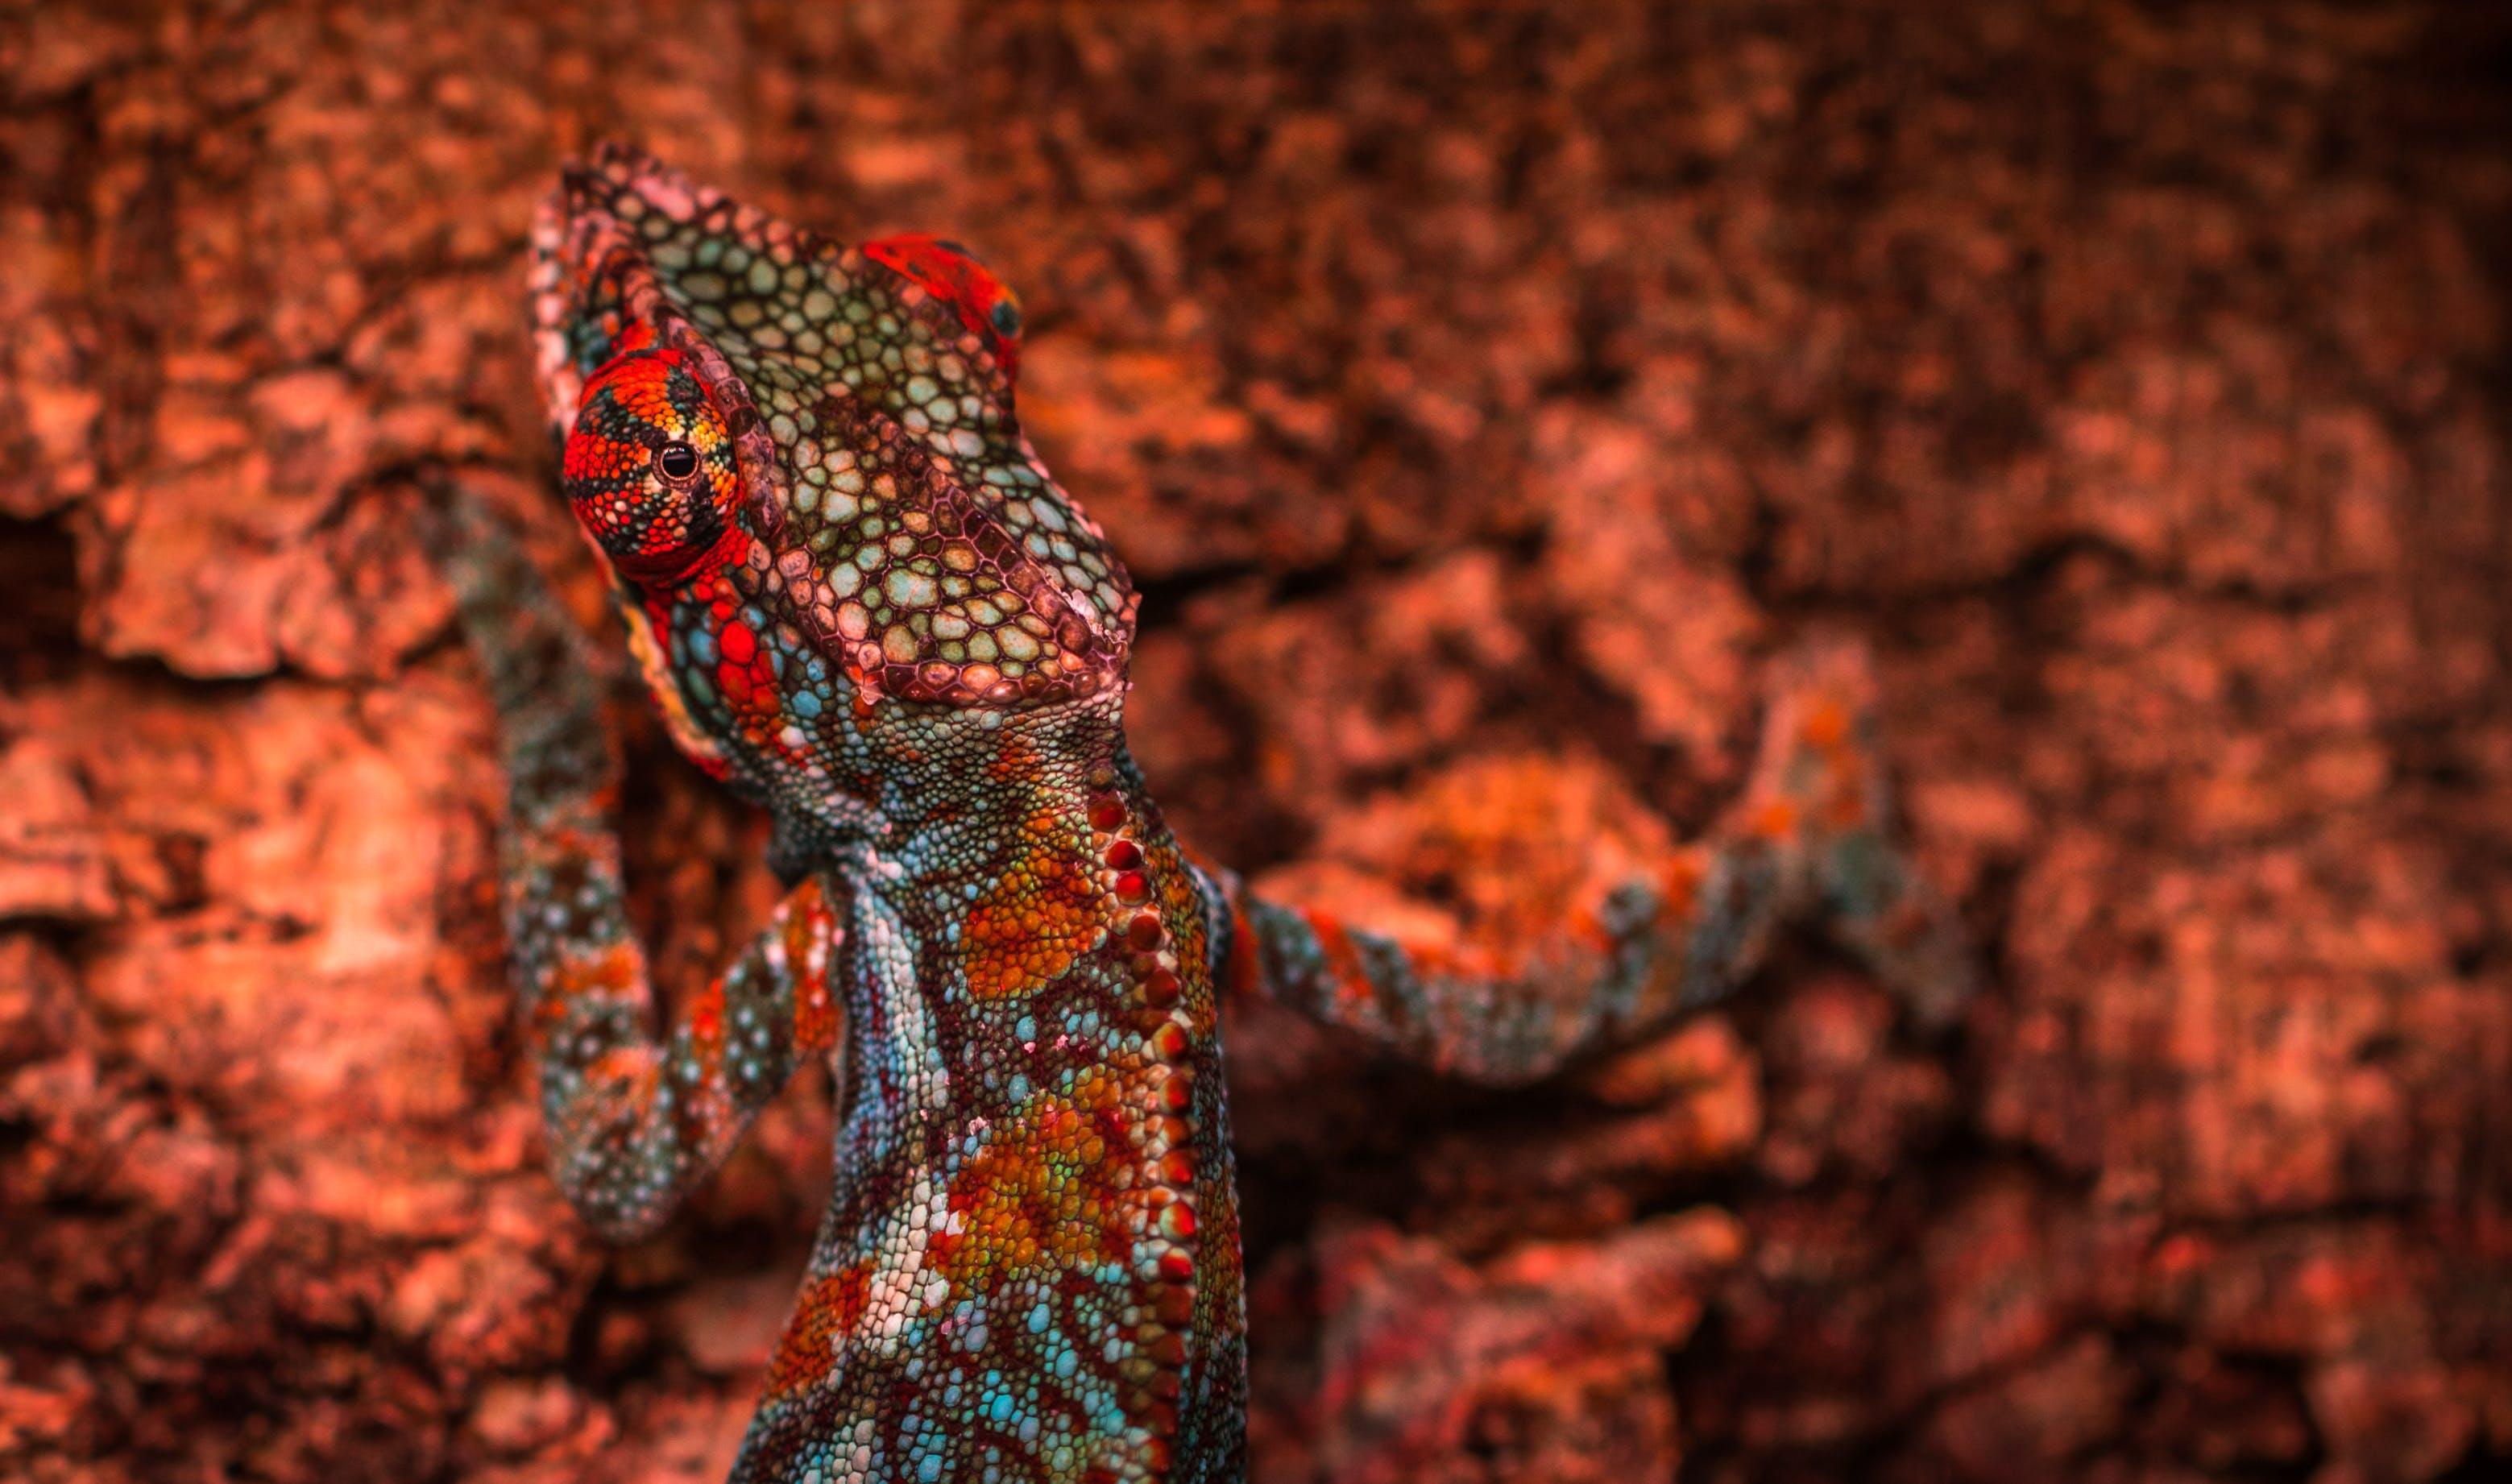 Close-up Photo Multicolored Lizard